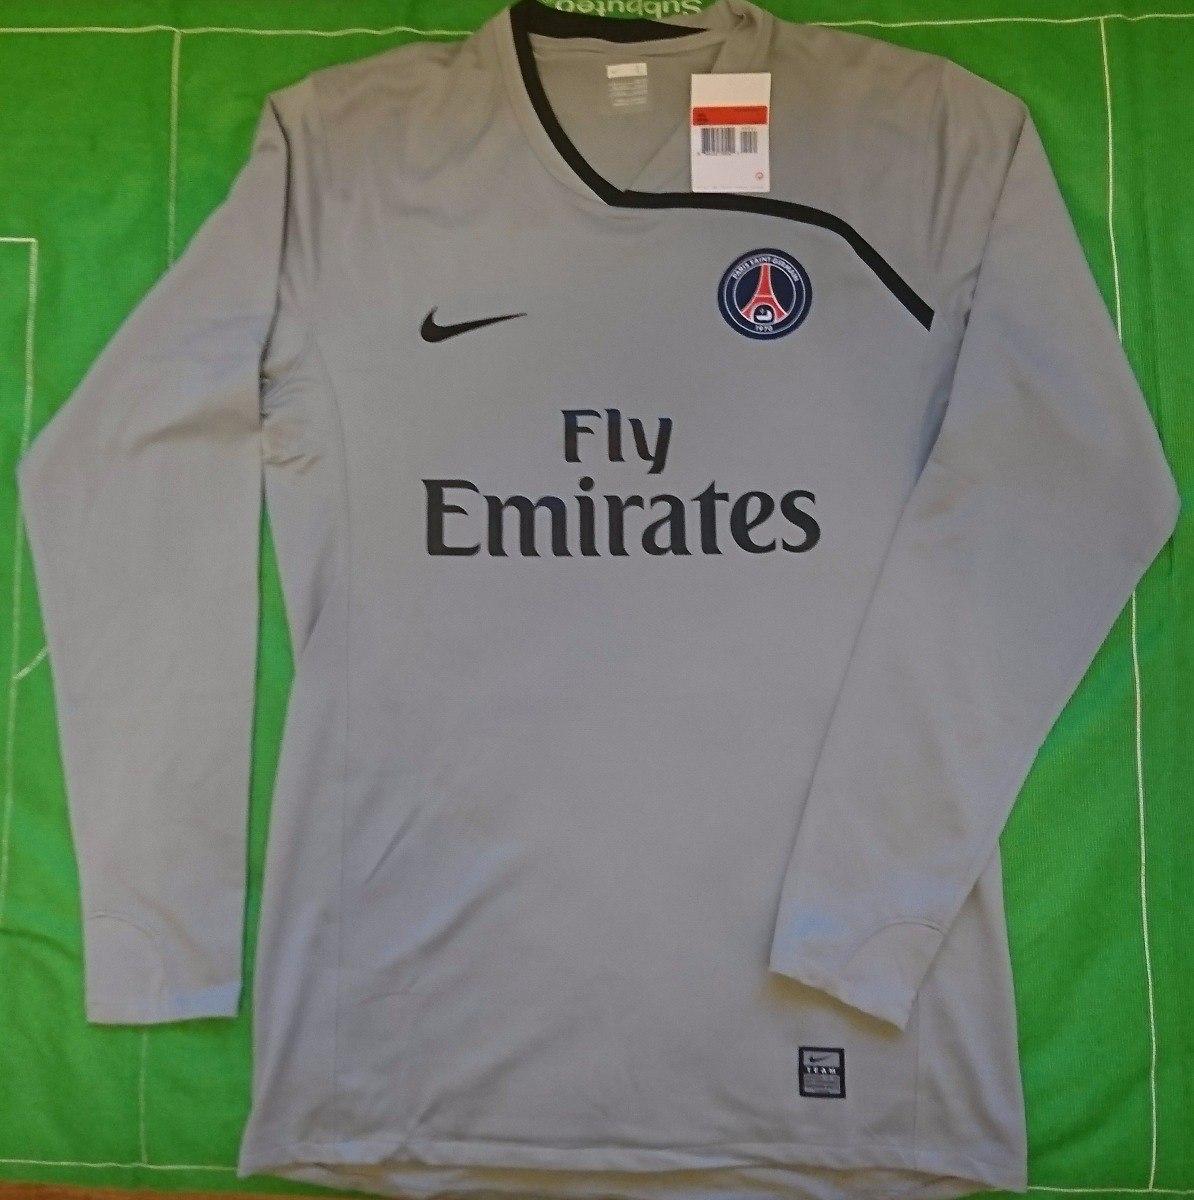 comprar camiseta Paris Saint Germain nuevas